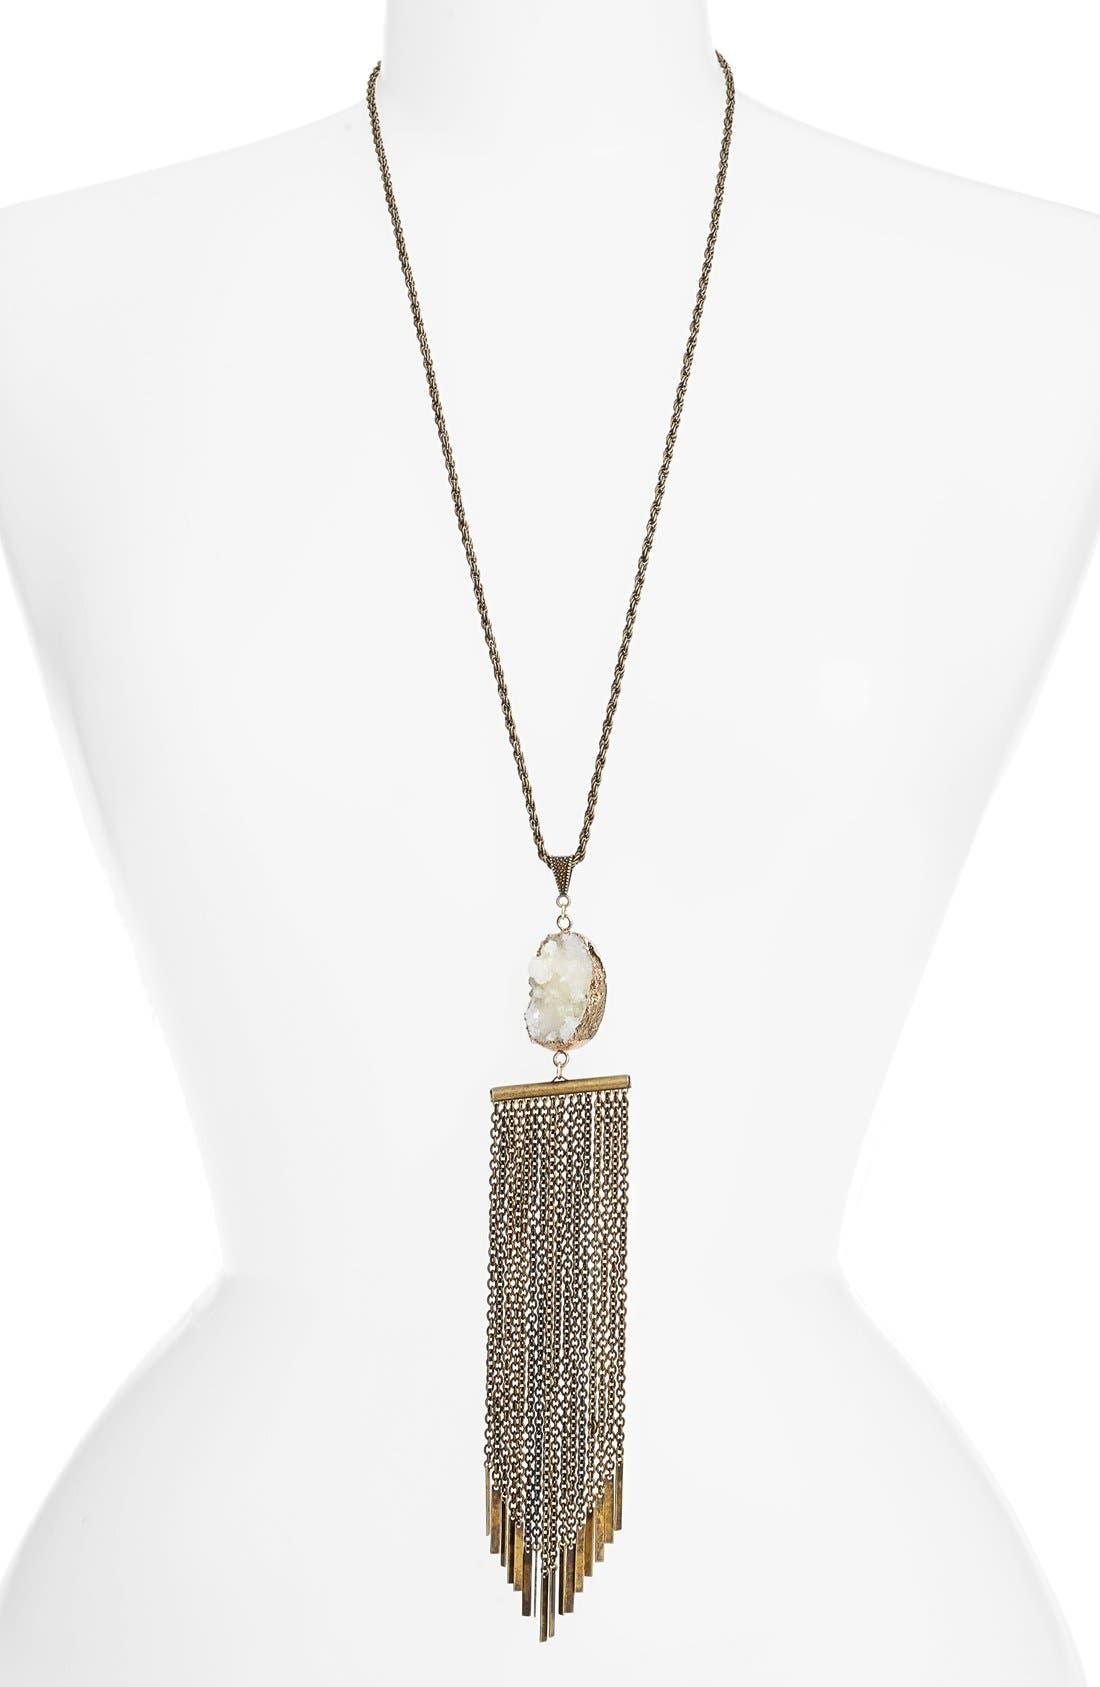 Main Image - Ettika Tassel Chain Statement Necklace